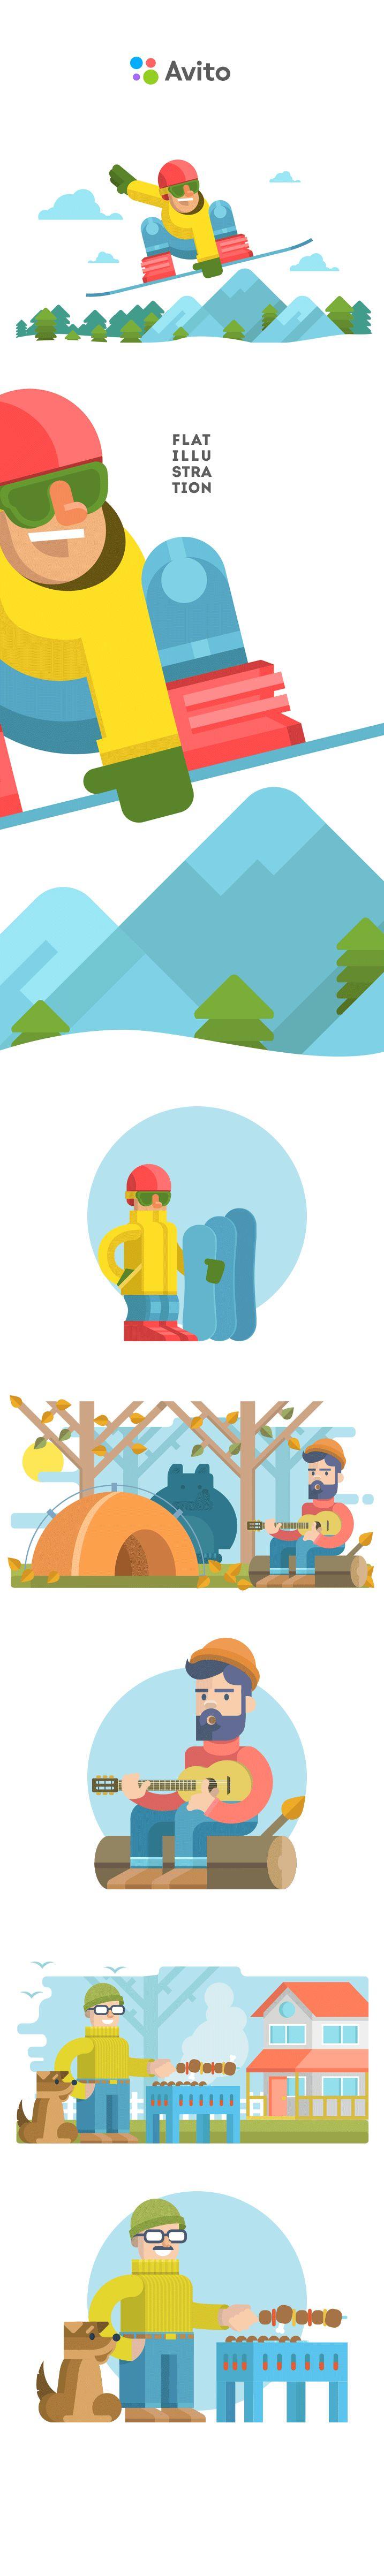 #flat_illustration Flat illustration for avito.ru https://www.behance.net/gallery/21410665/Flat-illustration-for-avitoru7eaf7a90e930555cd250697de14cb74c.gif (GIF Image, 717×4813 pixels)